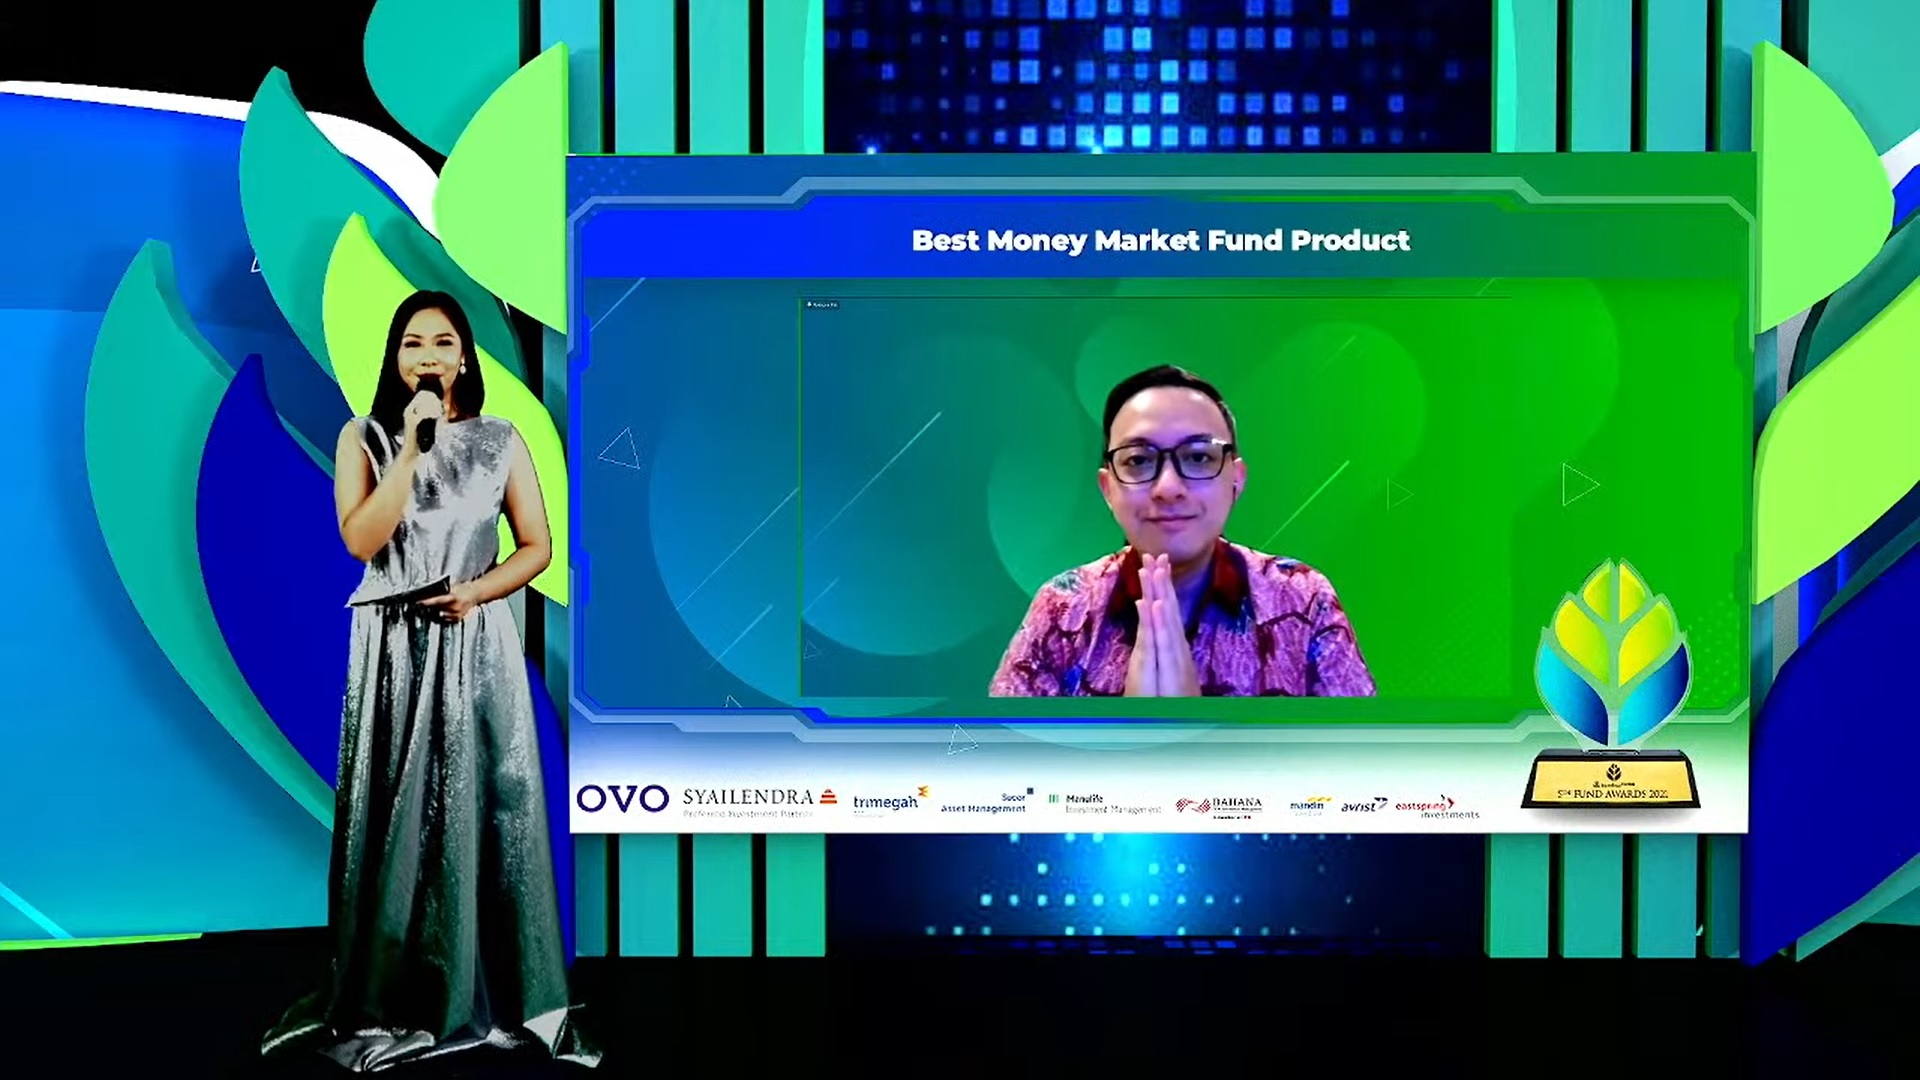 Juara Bareksa-Kontan 5th Fund Awards 2021, Begini Kinerja Reksadana Pasar Uang Syailendra Capital